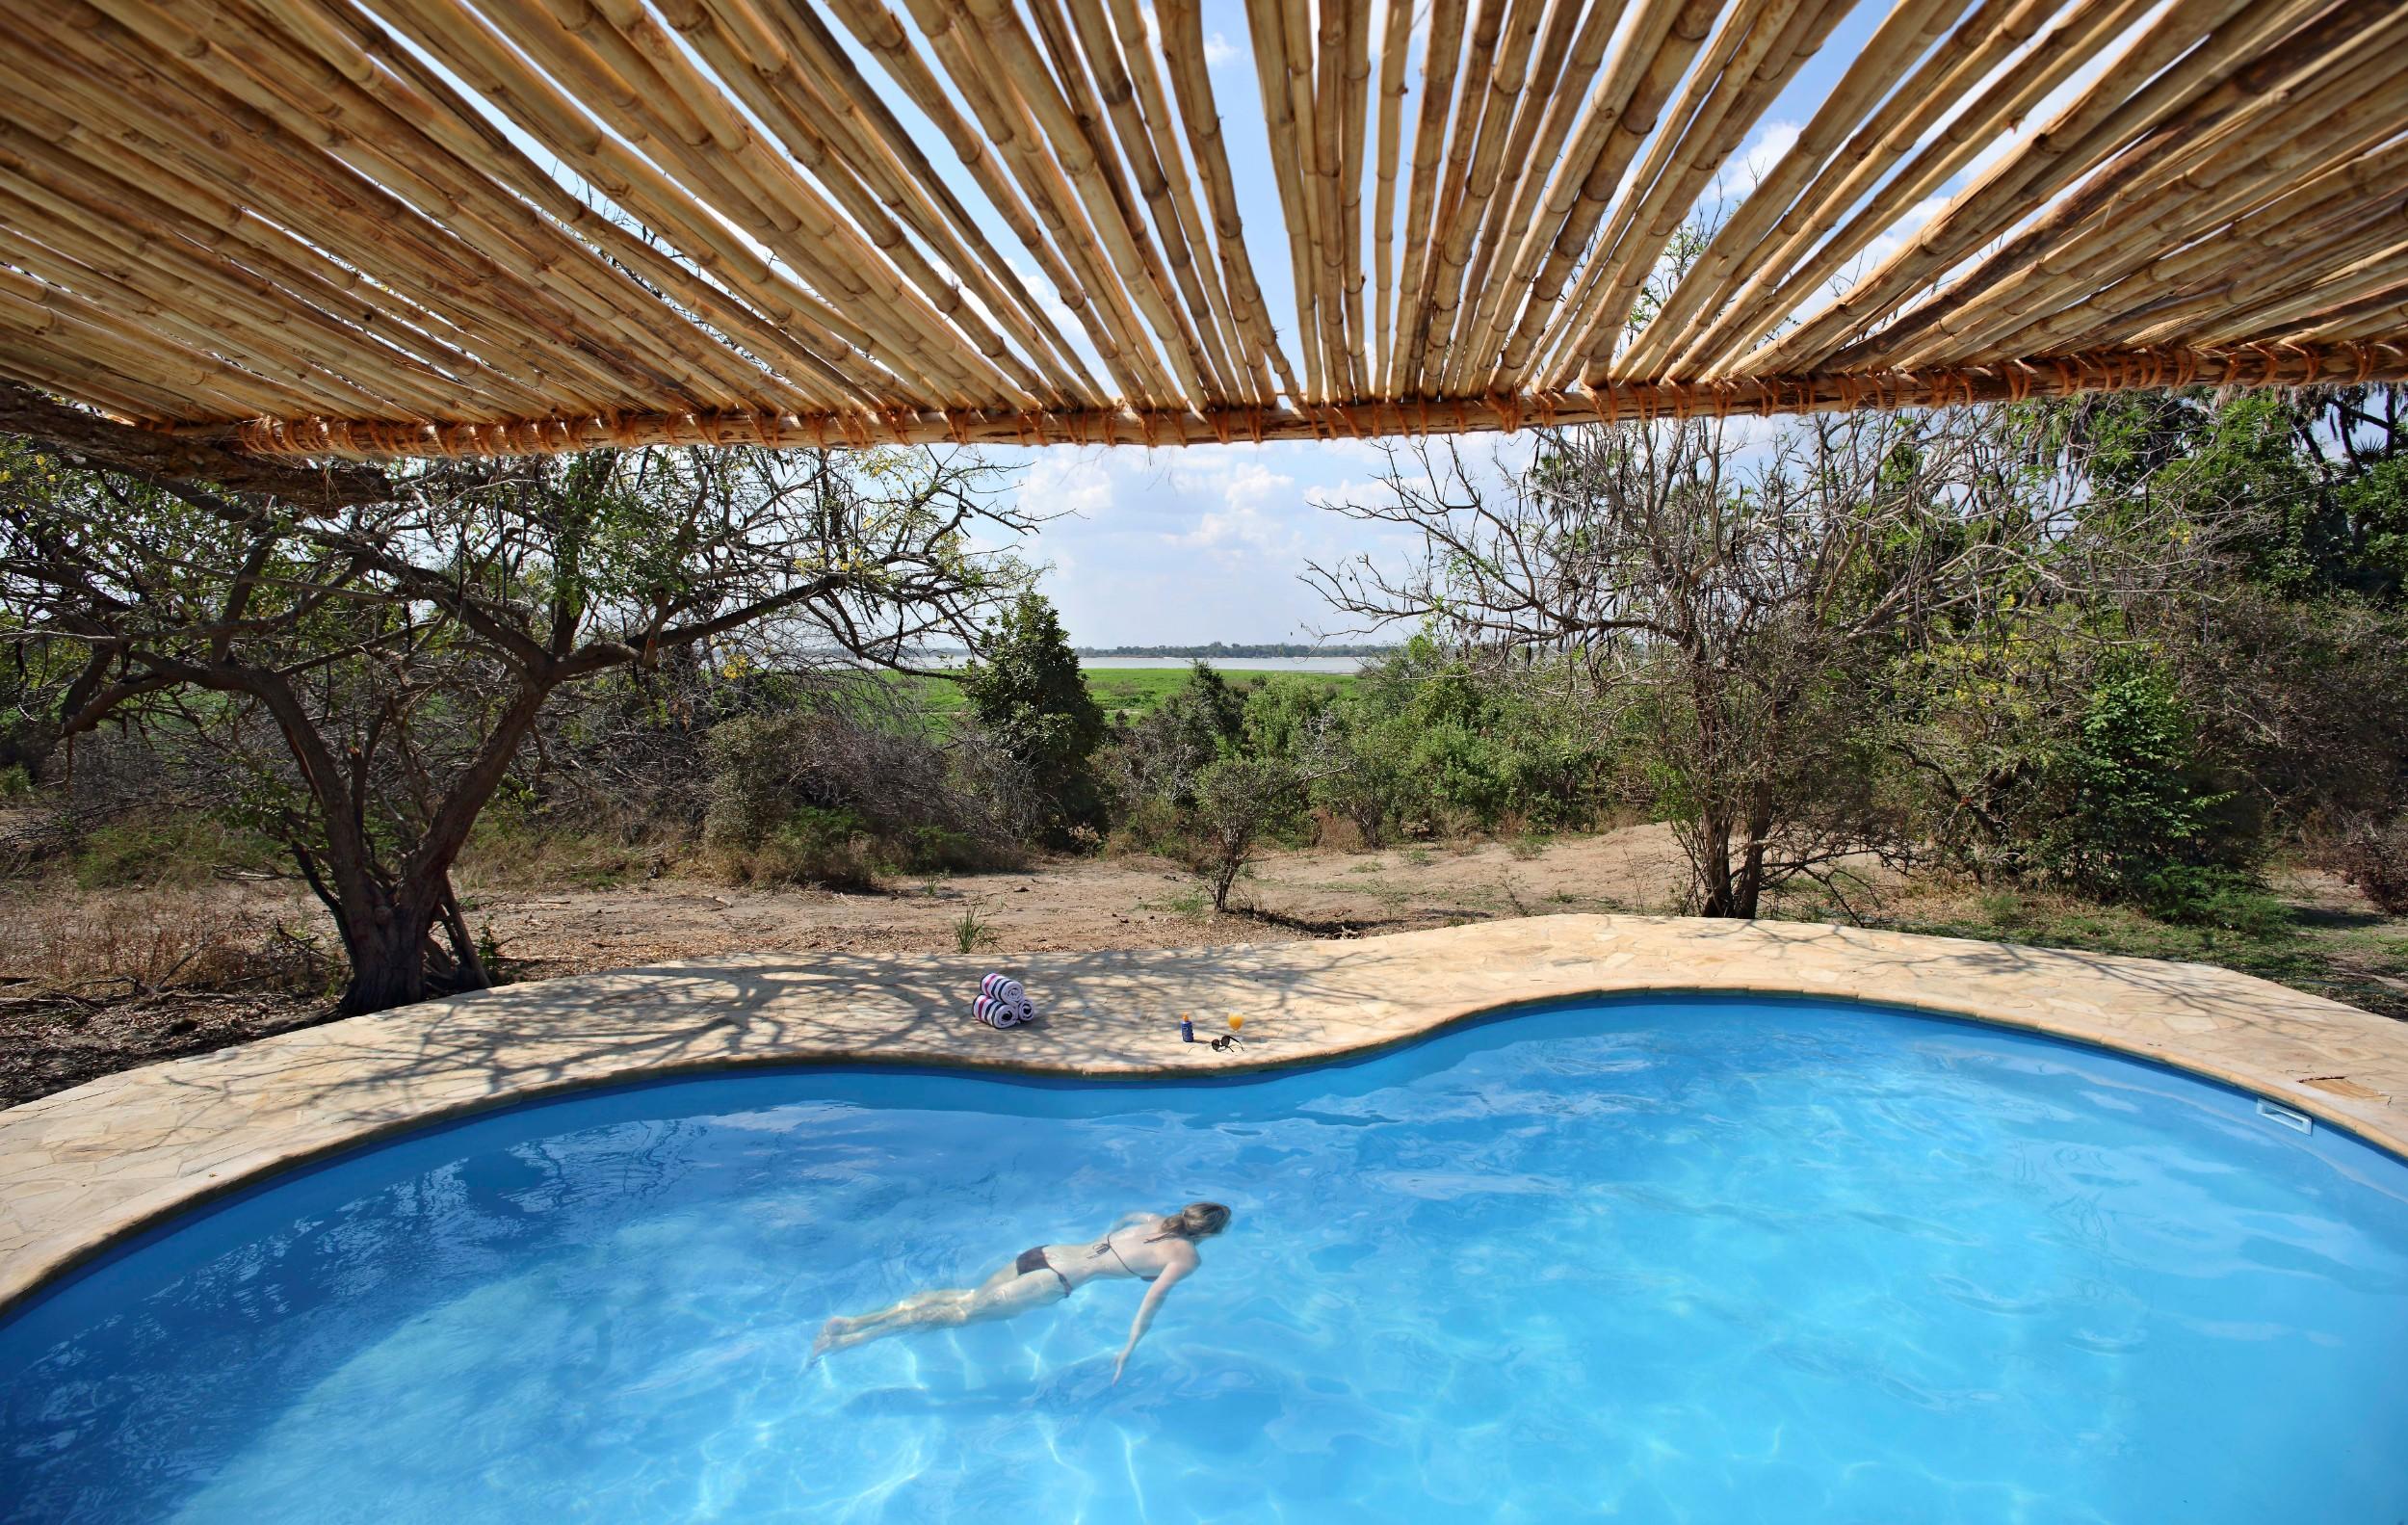 Swimming-pool-with-view-of-lake-Roho.jpg